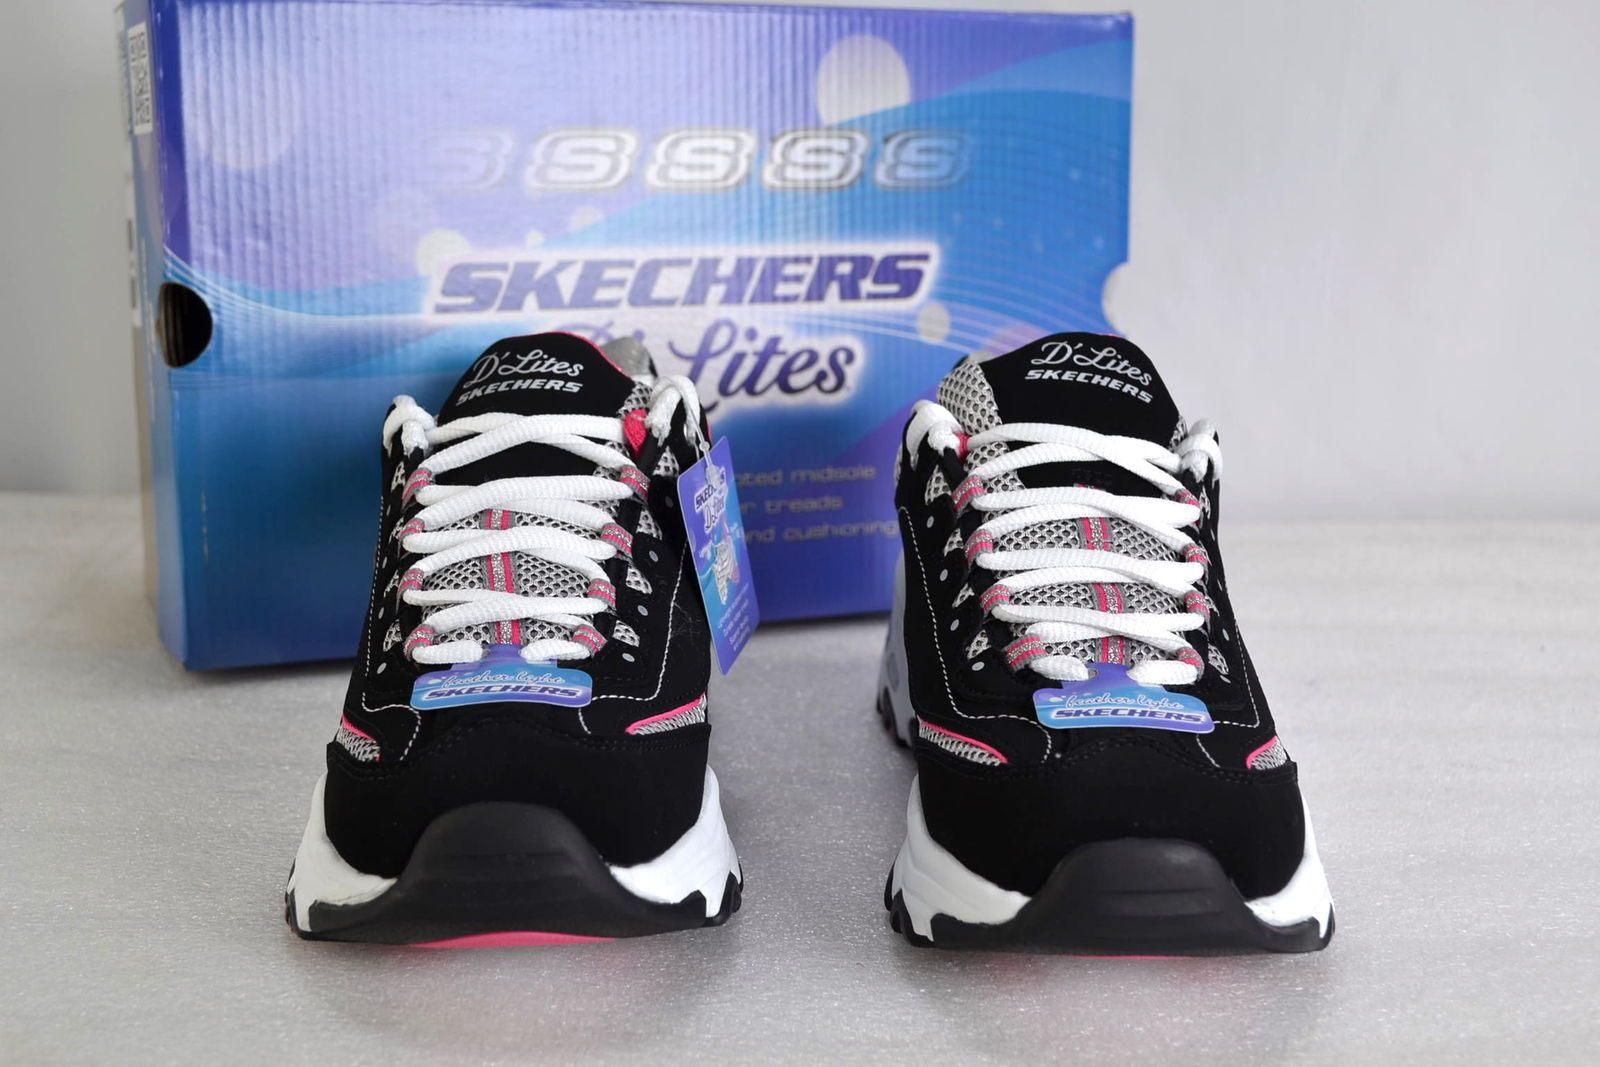 Skechers D Lites 2 Bel Skechers 6m Black White Pink Centennial D Lites Lace Up